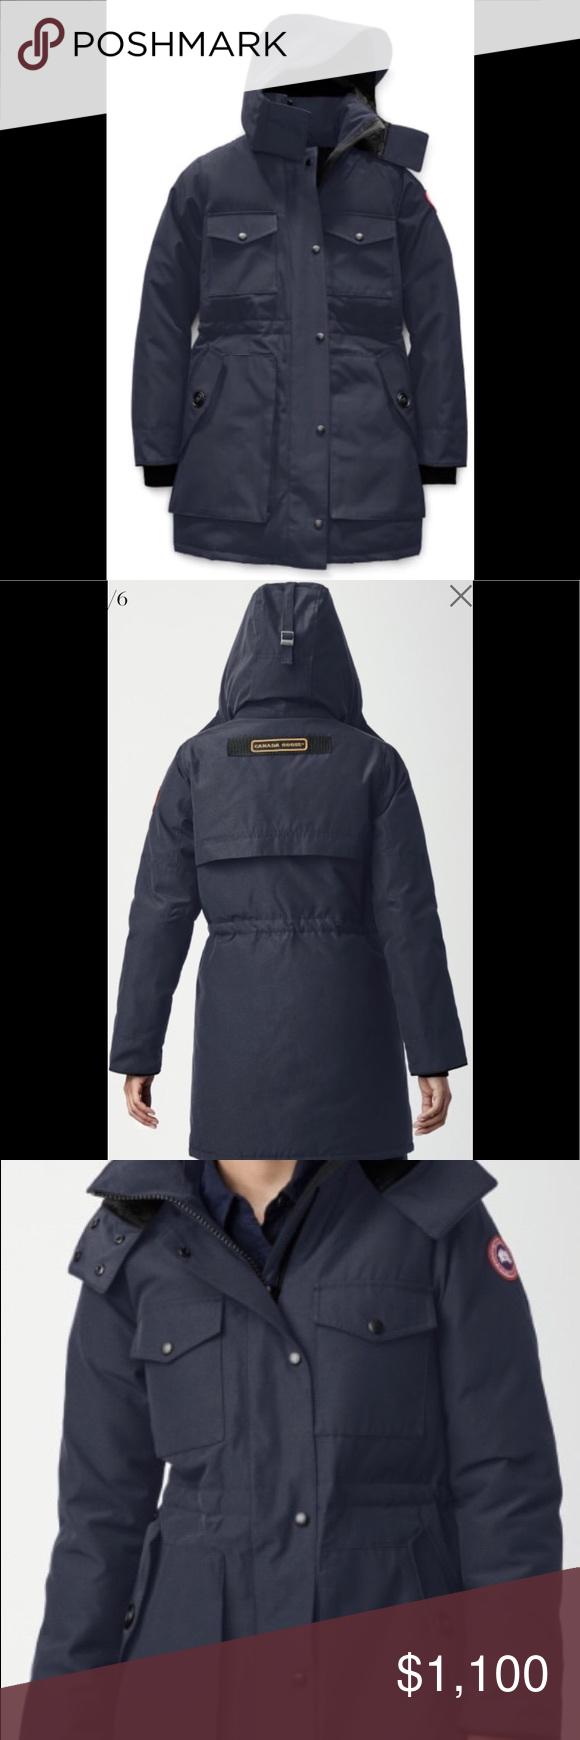 Canada Goose Gabriola Parka Xs Clothes Design Fashion Design Fashion Tips